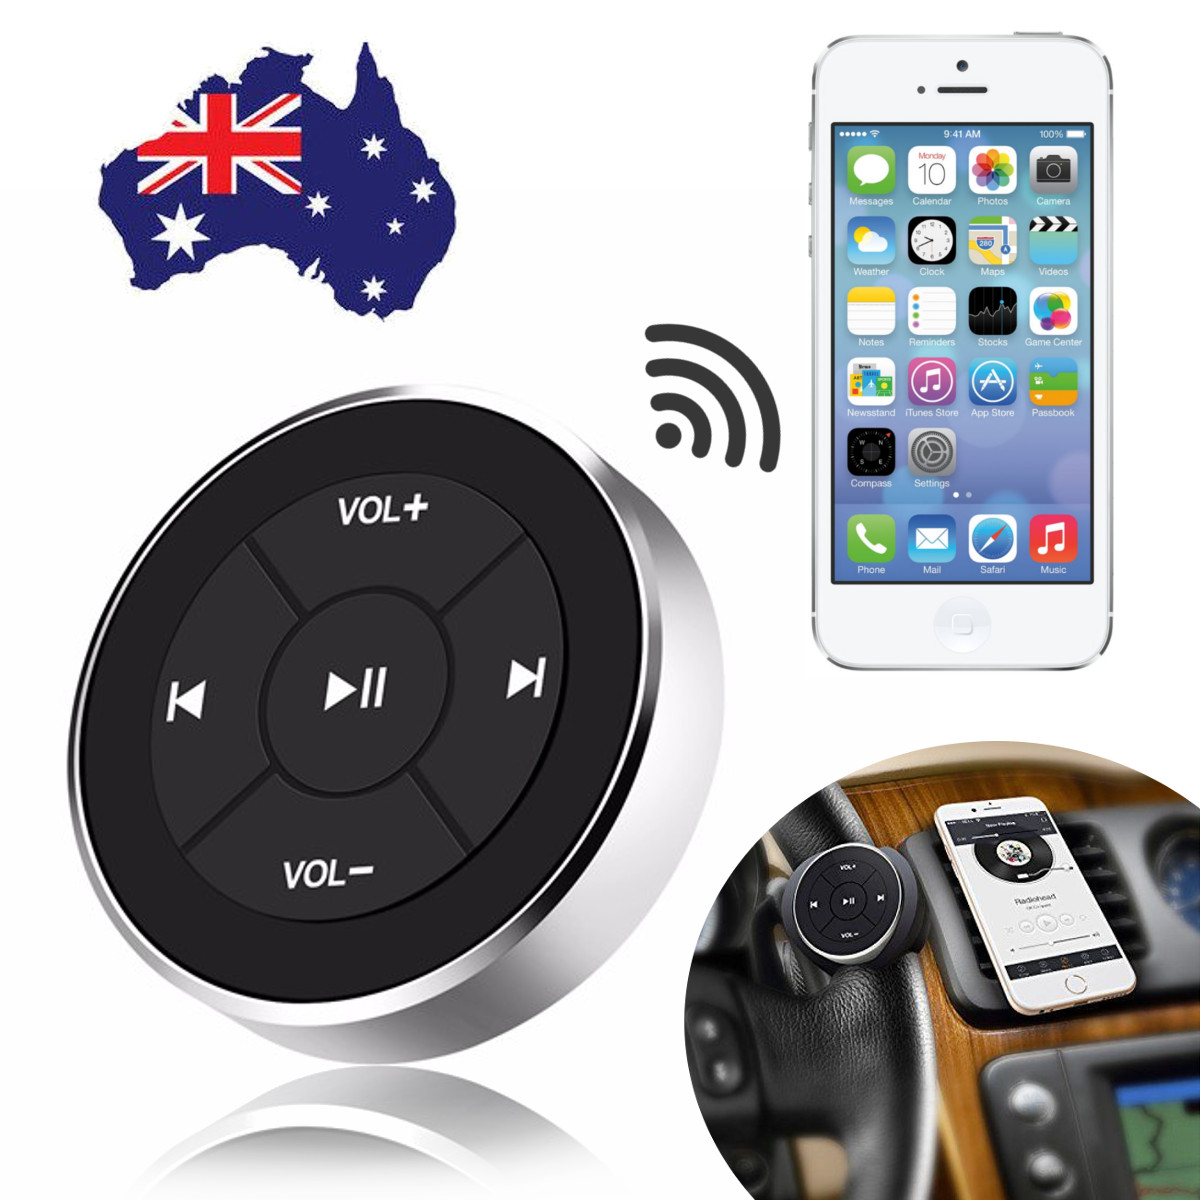 IMars BT-005 12M Car Bluetooth Receiver Media Button Series Remote Control Smartphone Audio Video Bluetooth Media Button